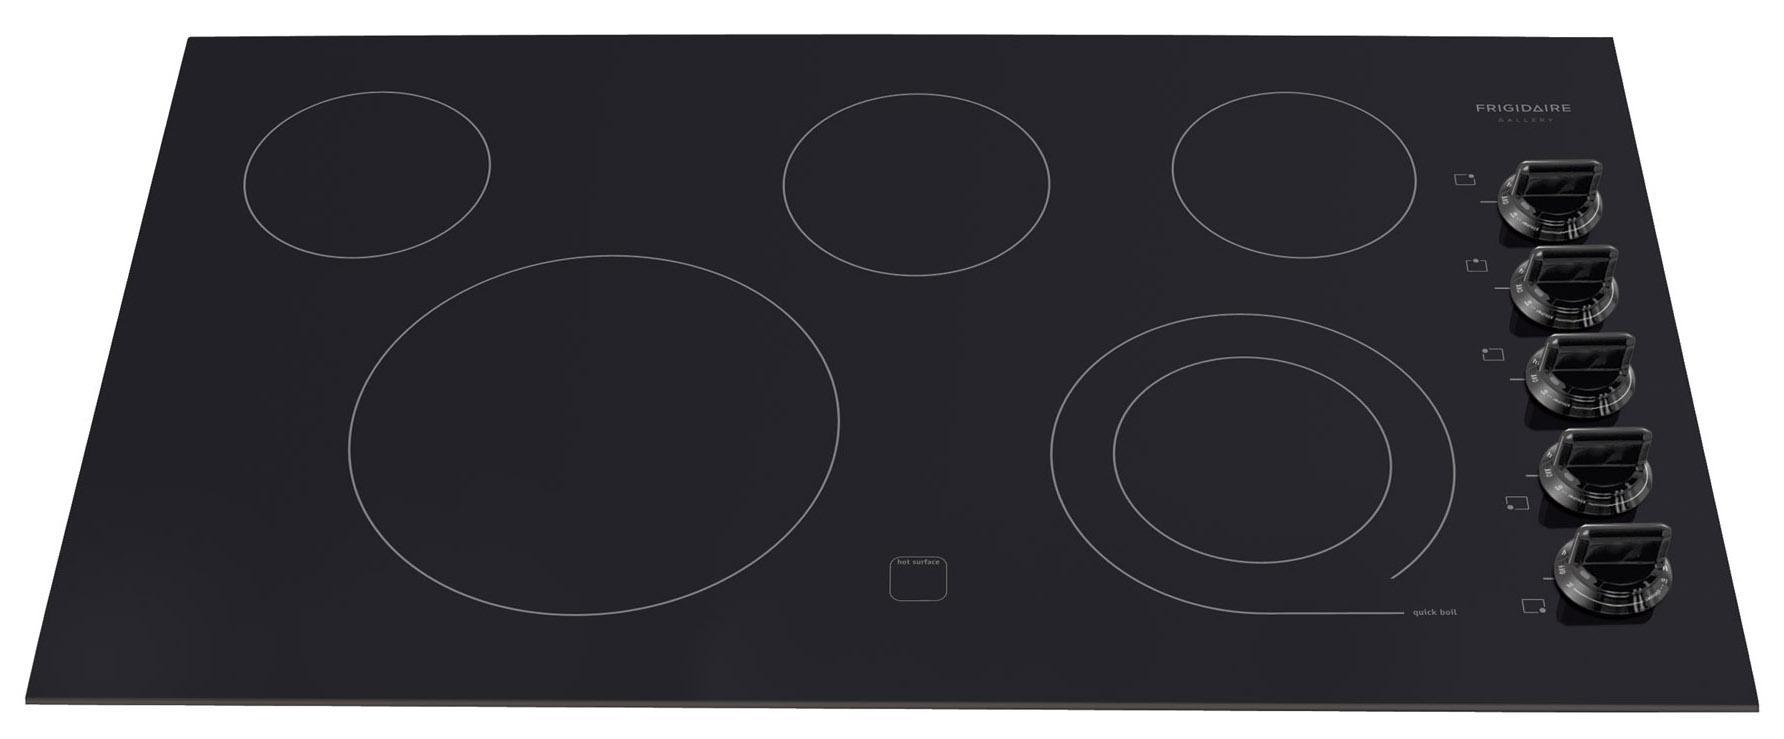 "Frigidaire Frigidaire Gallery Electric Cooktops Gallery 36"" Built-In Electric Cooktop - Item Number: FGEC3645KB"